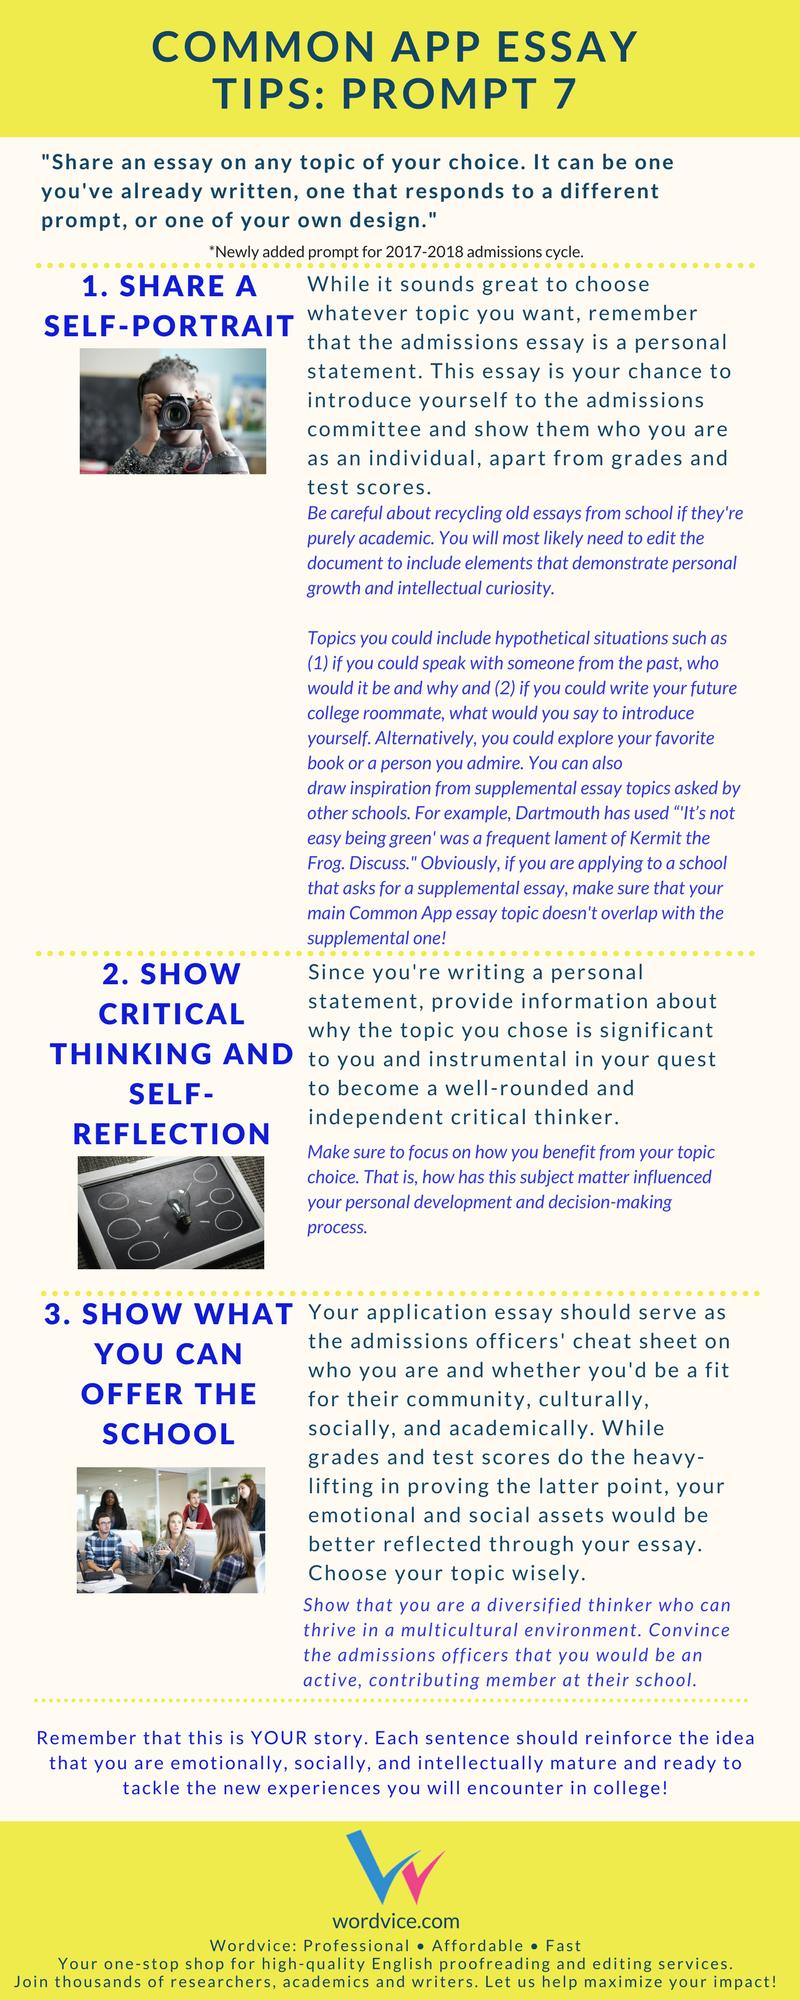 008 Common App Brainstormprompt Essay Example Unusual Prompt Prompts Usc Examples 1 4 Full